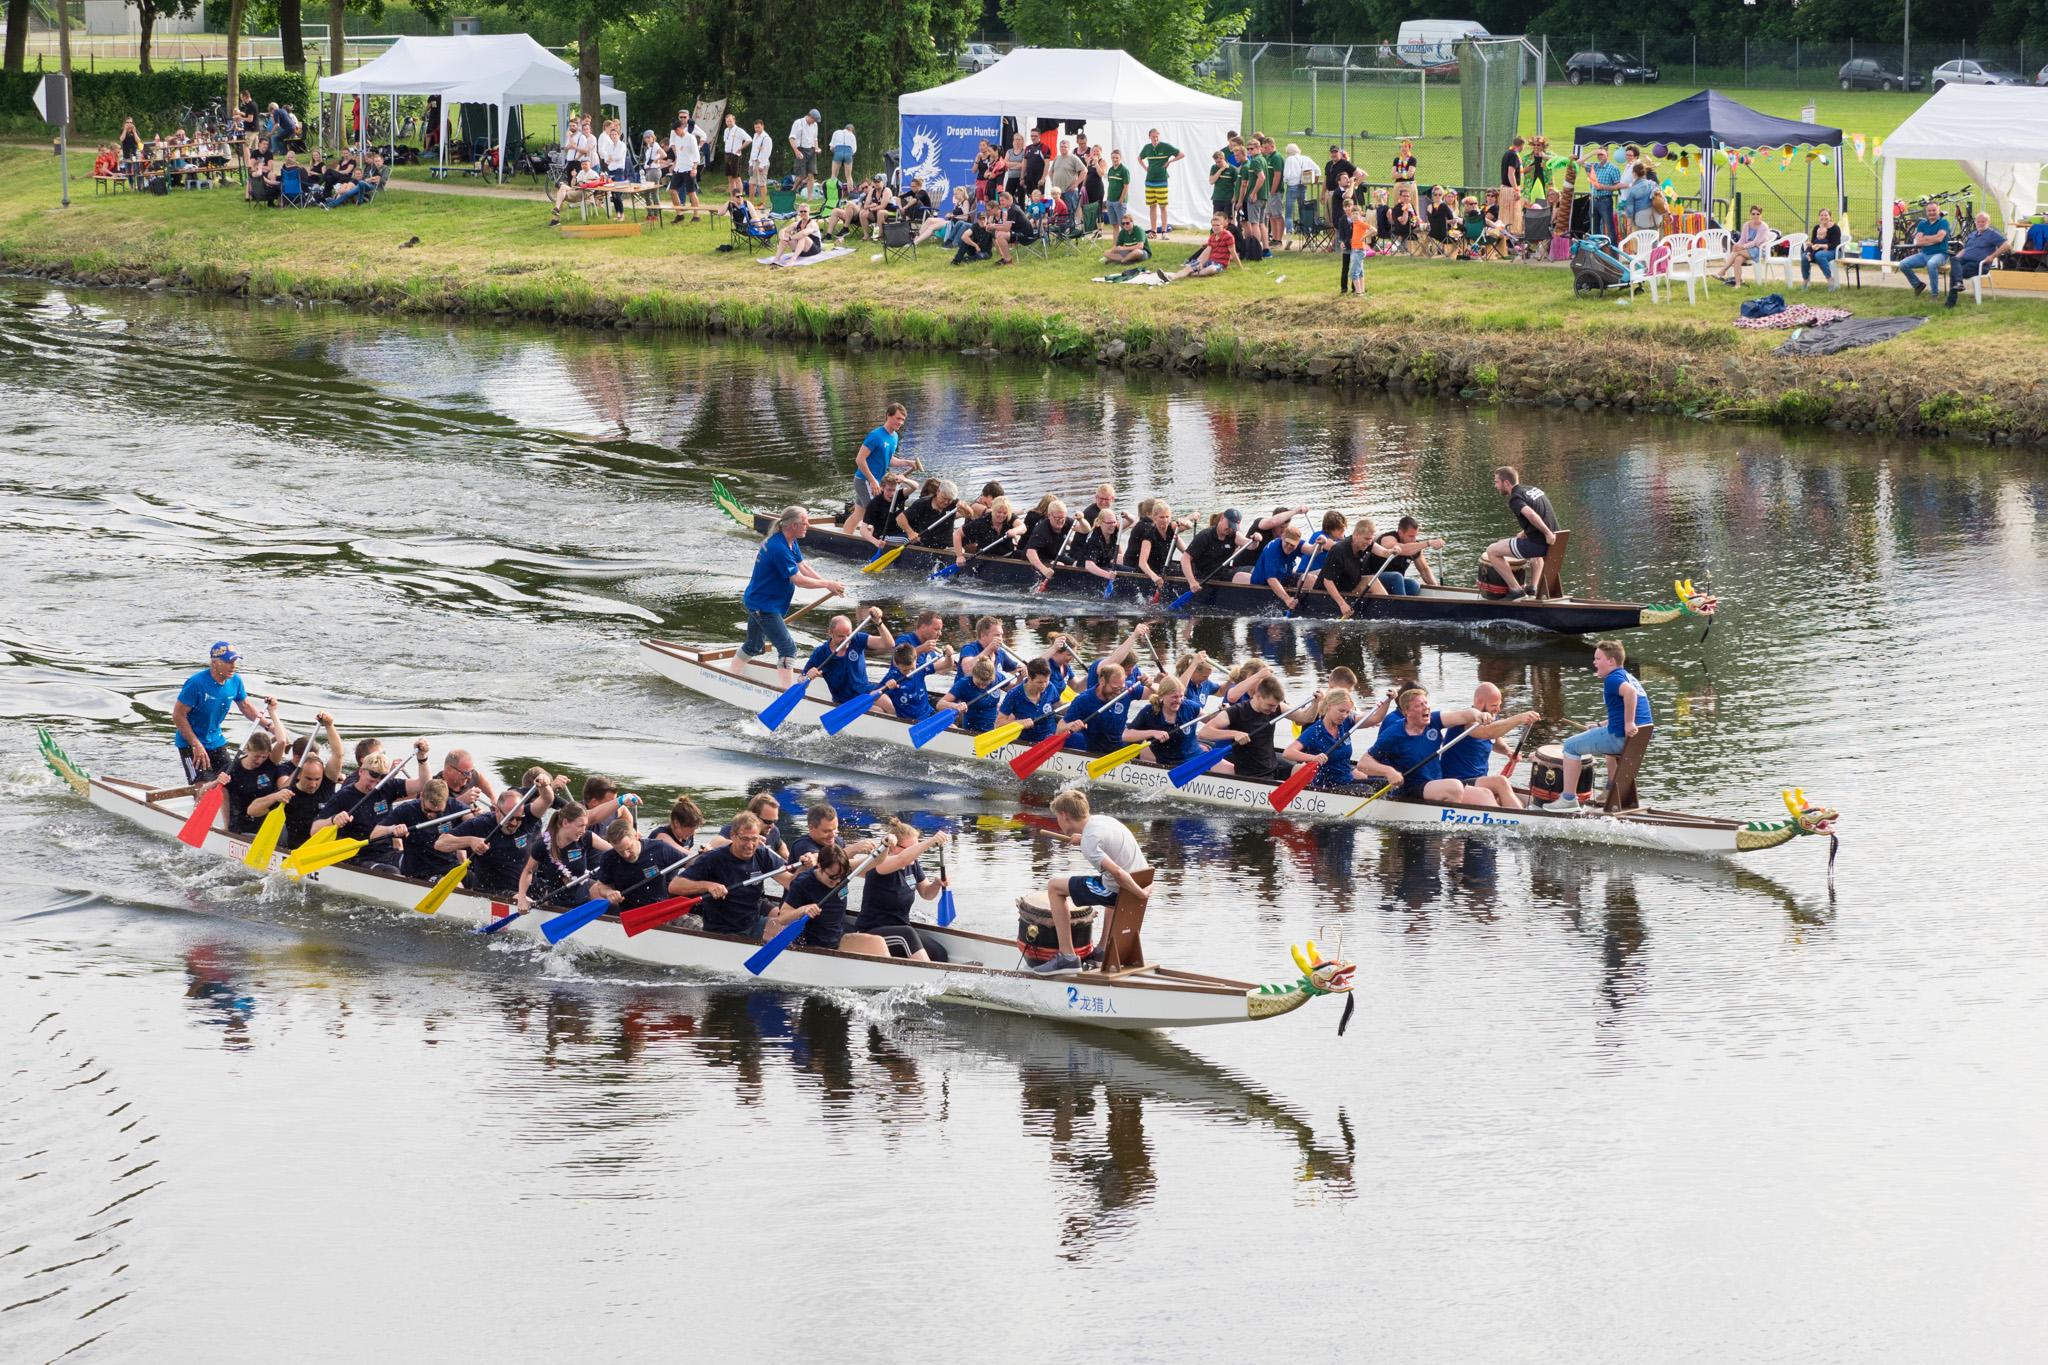 Lingener Drachenboot Cup, competició piraguisme